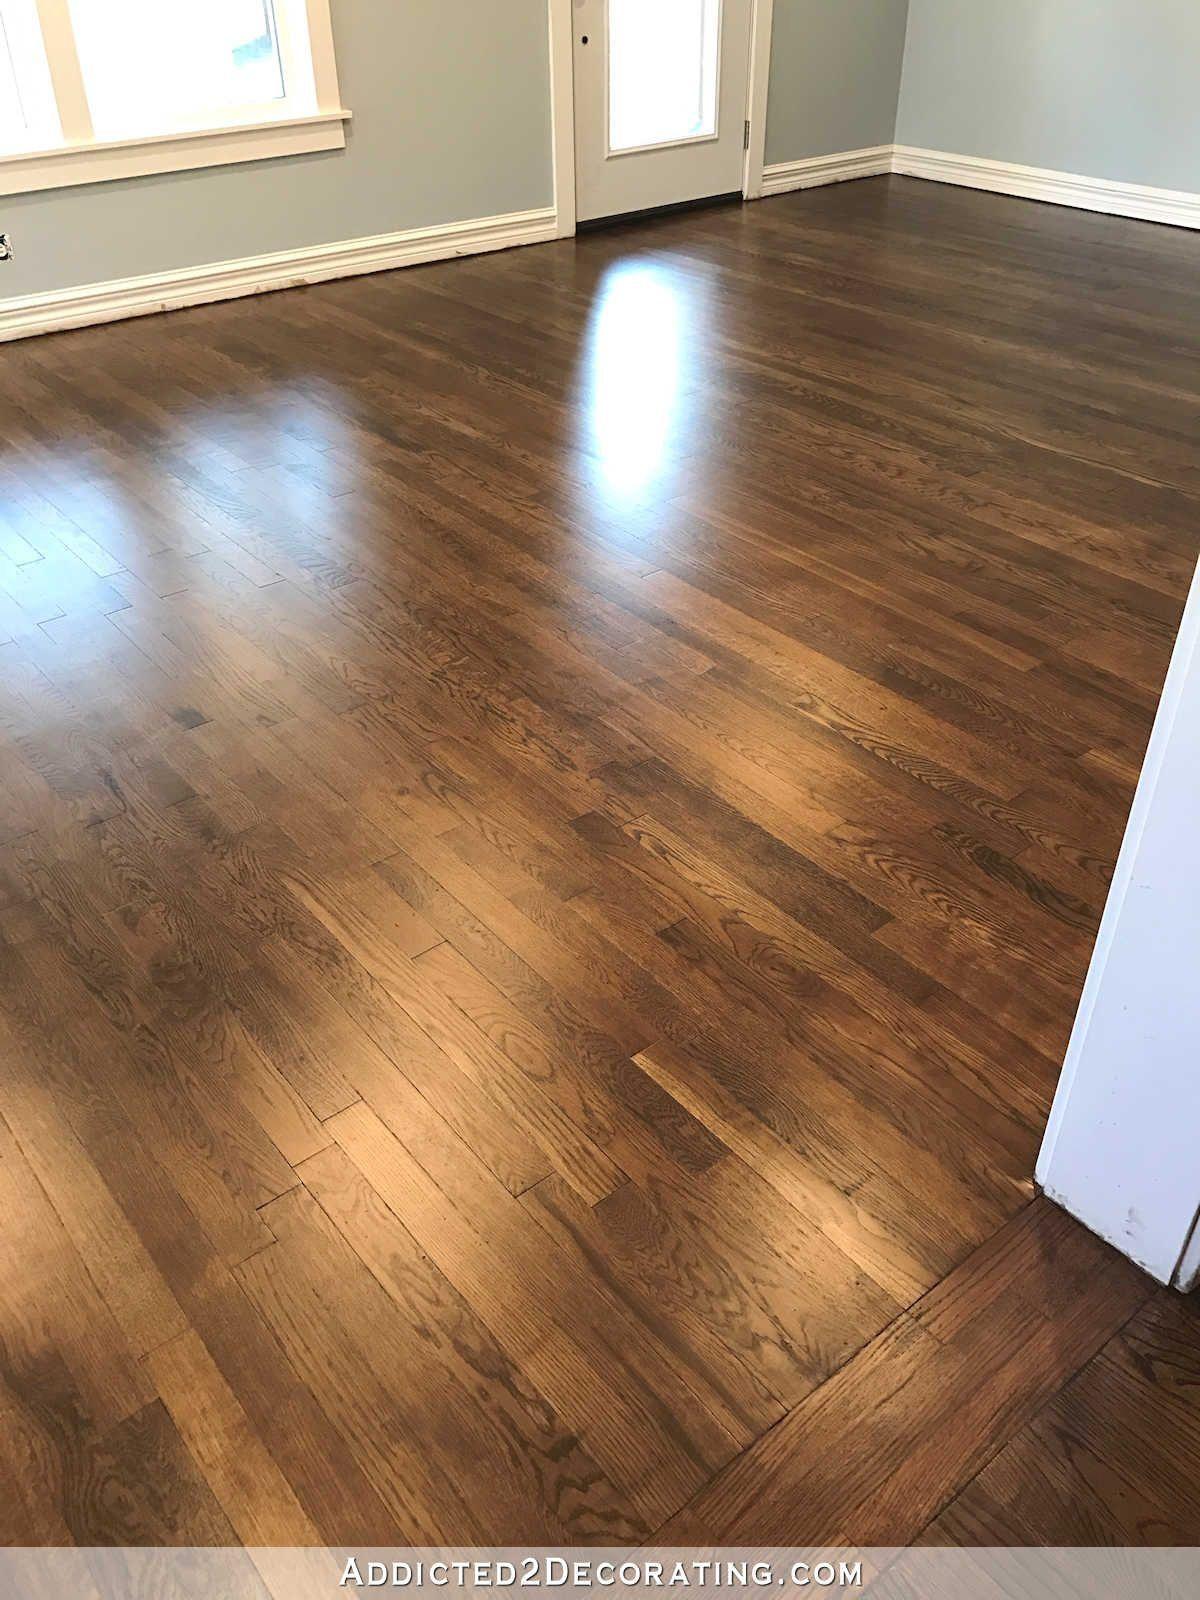 1000 in 2020 Red oak hardwood floors, Red oak hardwood